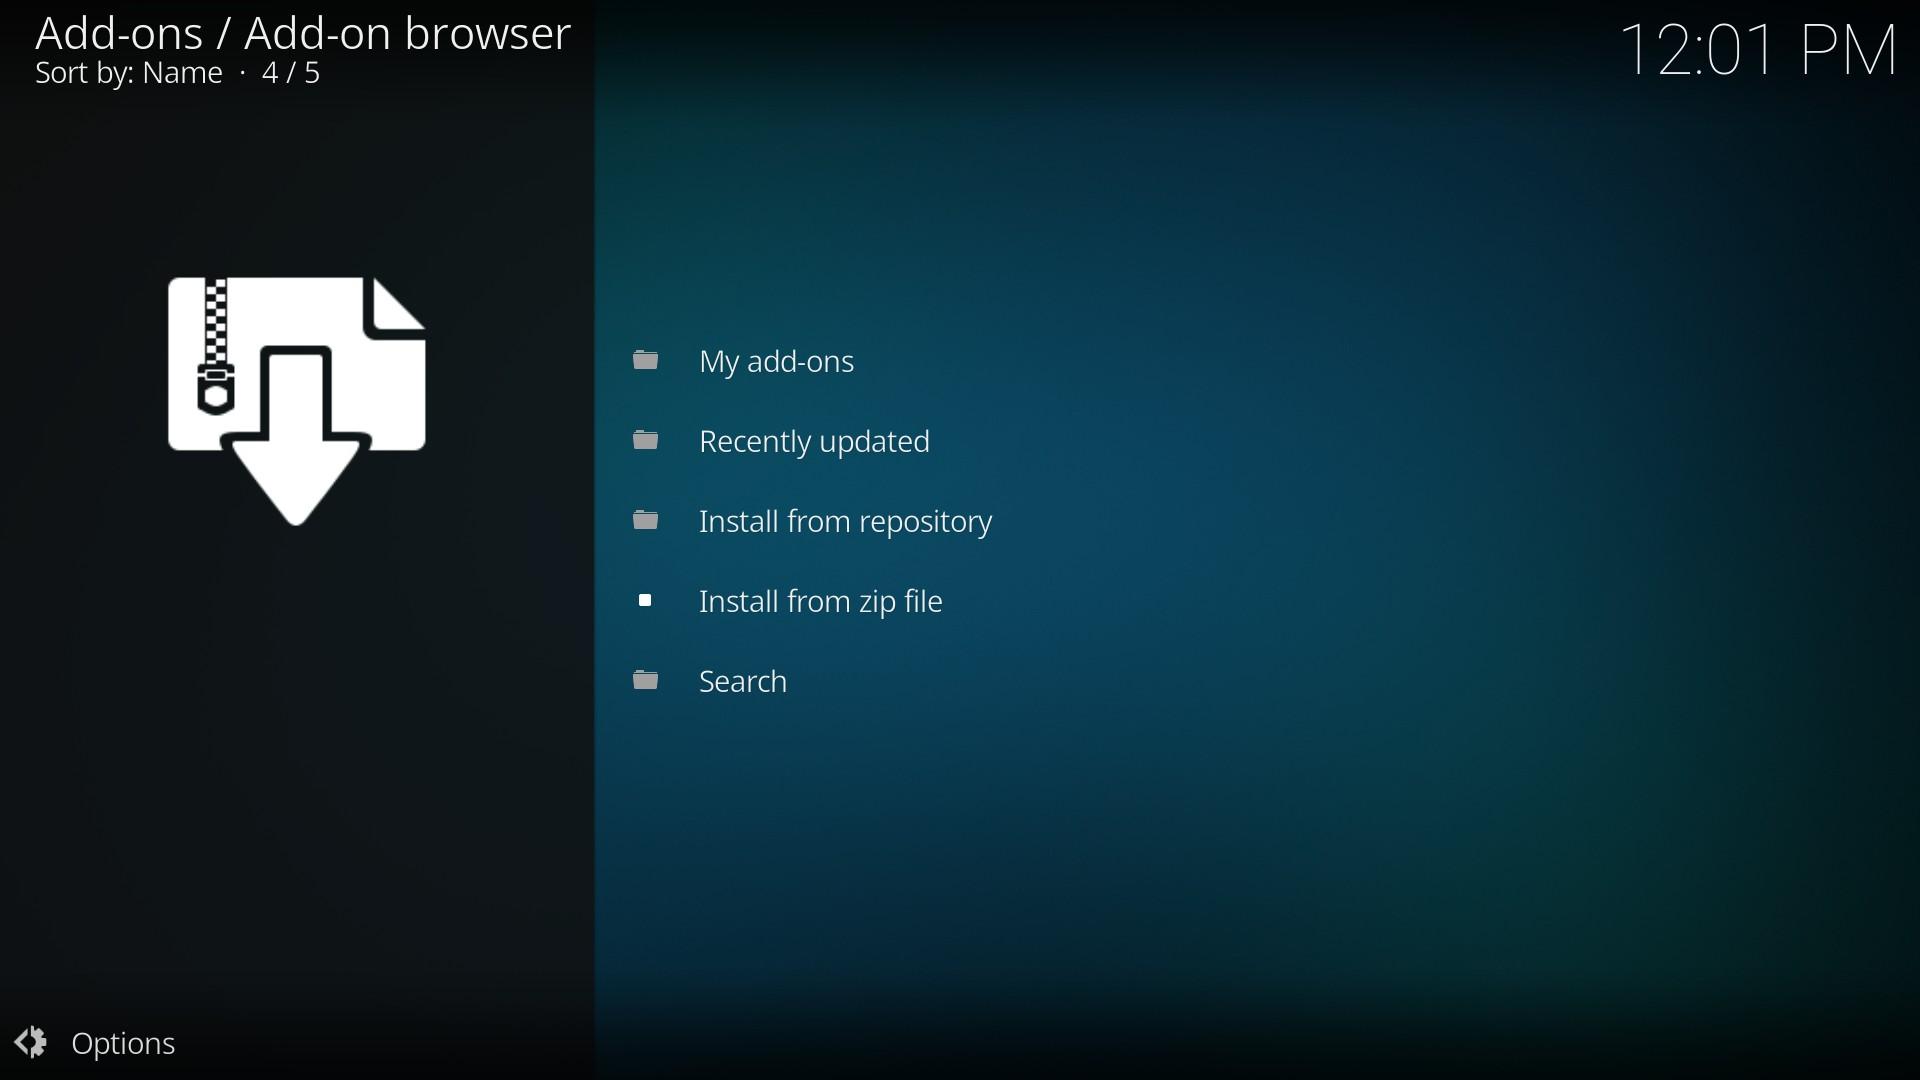 Kodi 17.4 Krypton - install from zip file